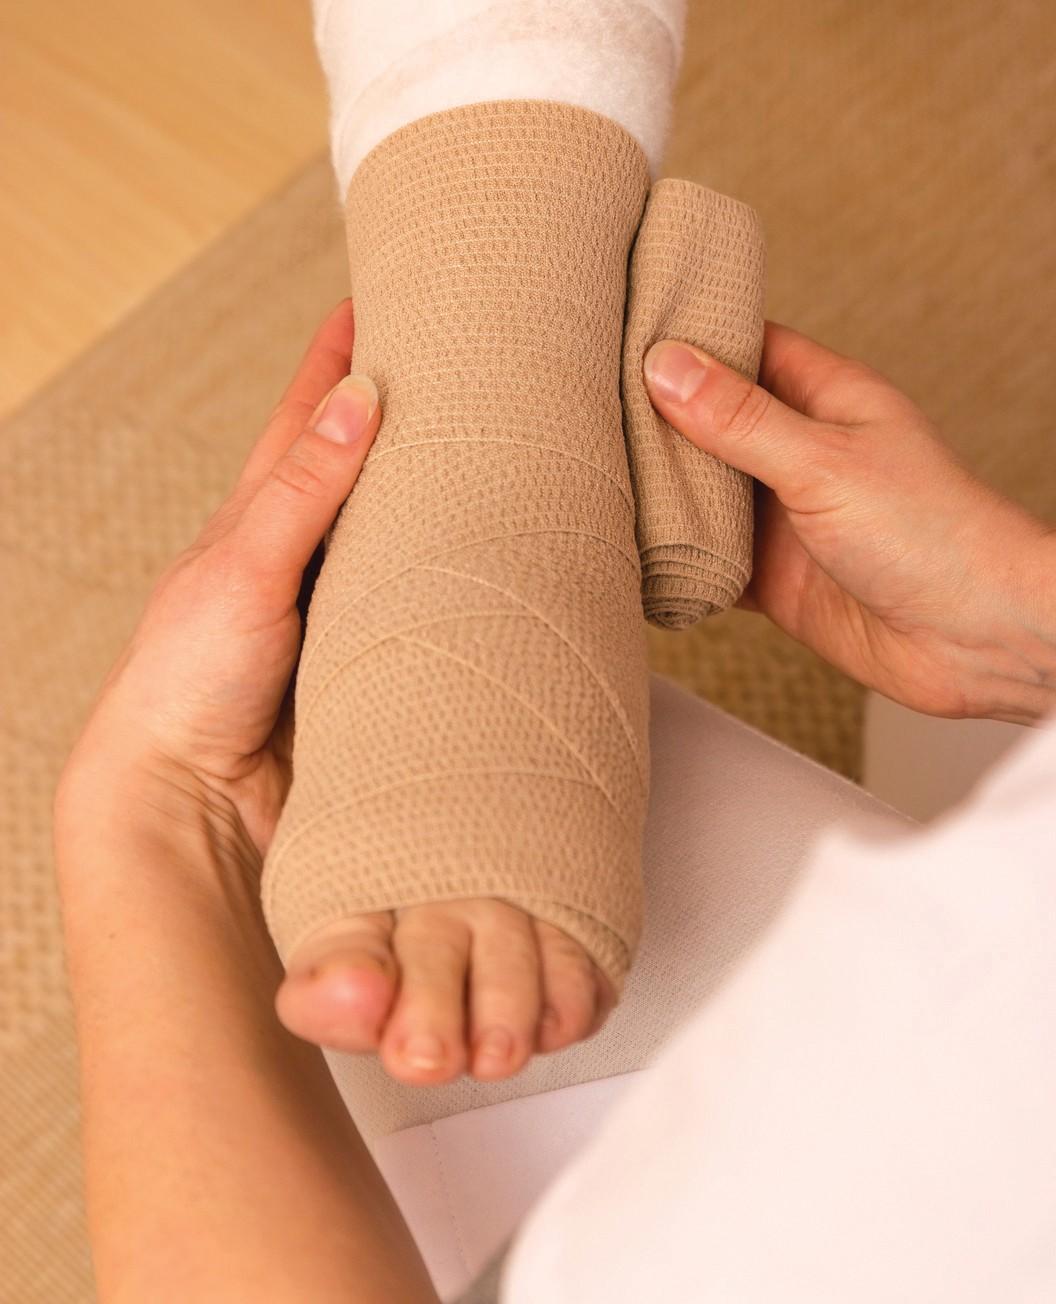 Diagnosis: lower limb lymphostasis. Treatment with folk remedies, medications, massages